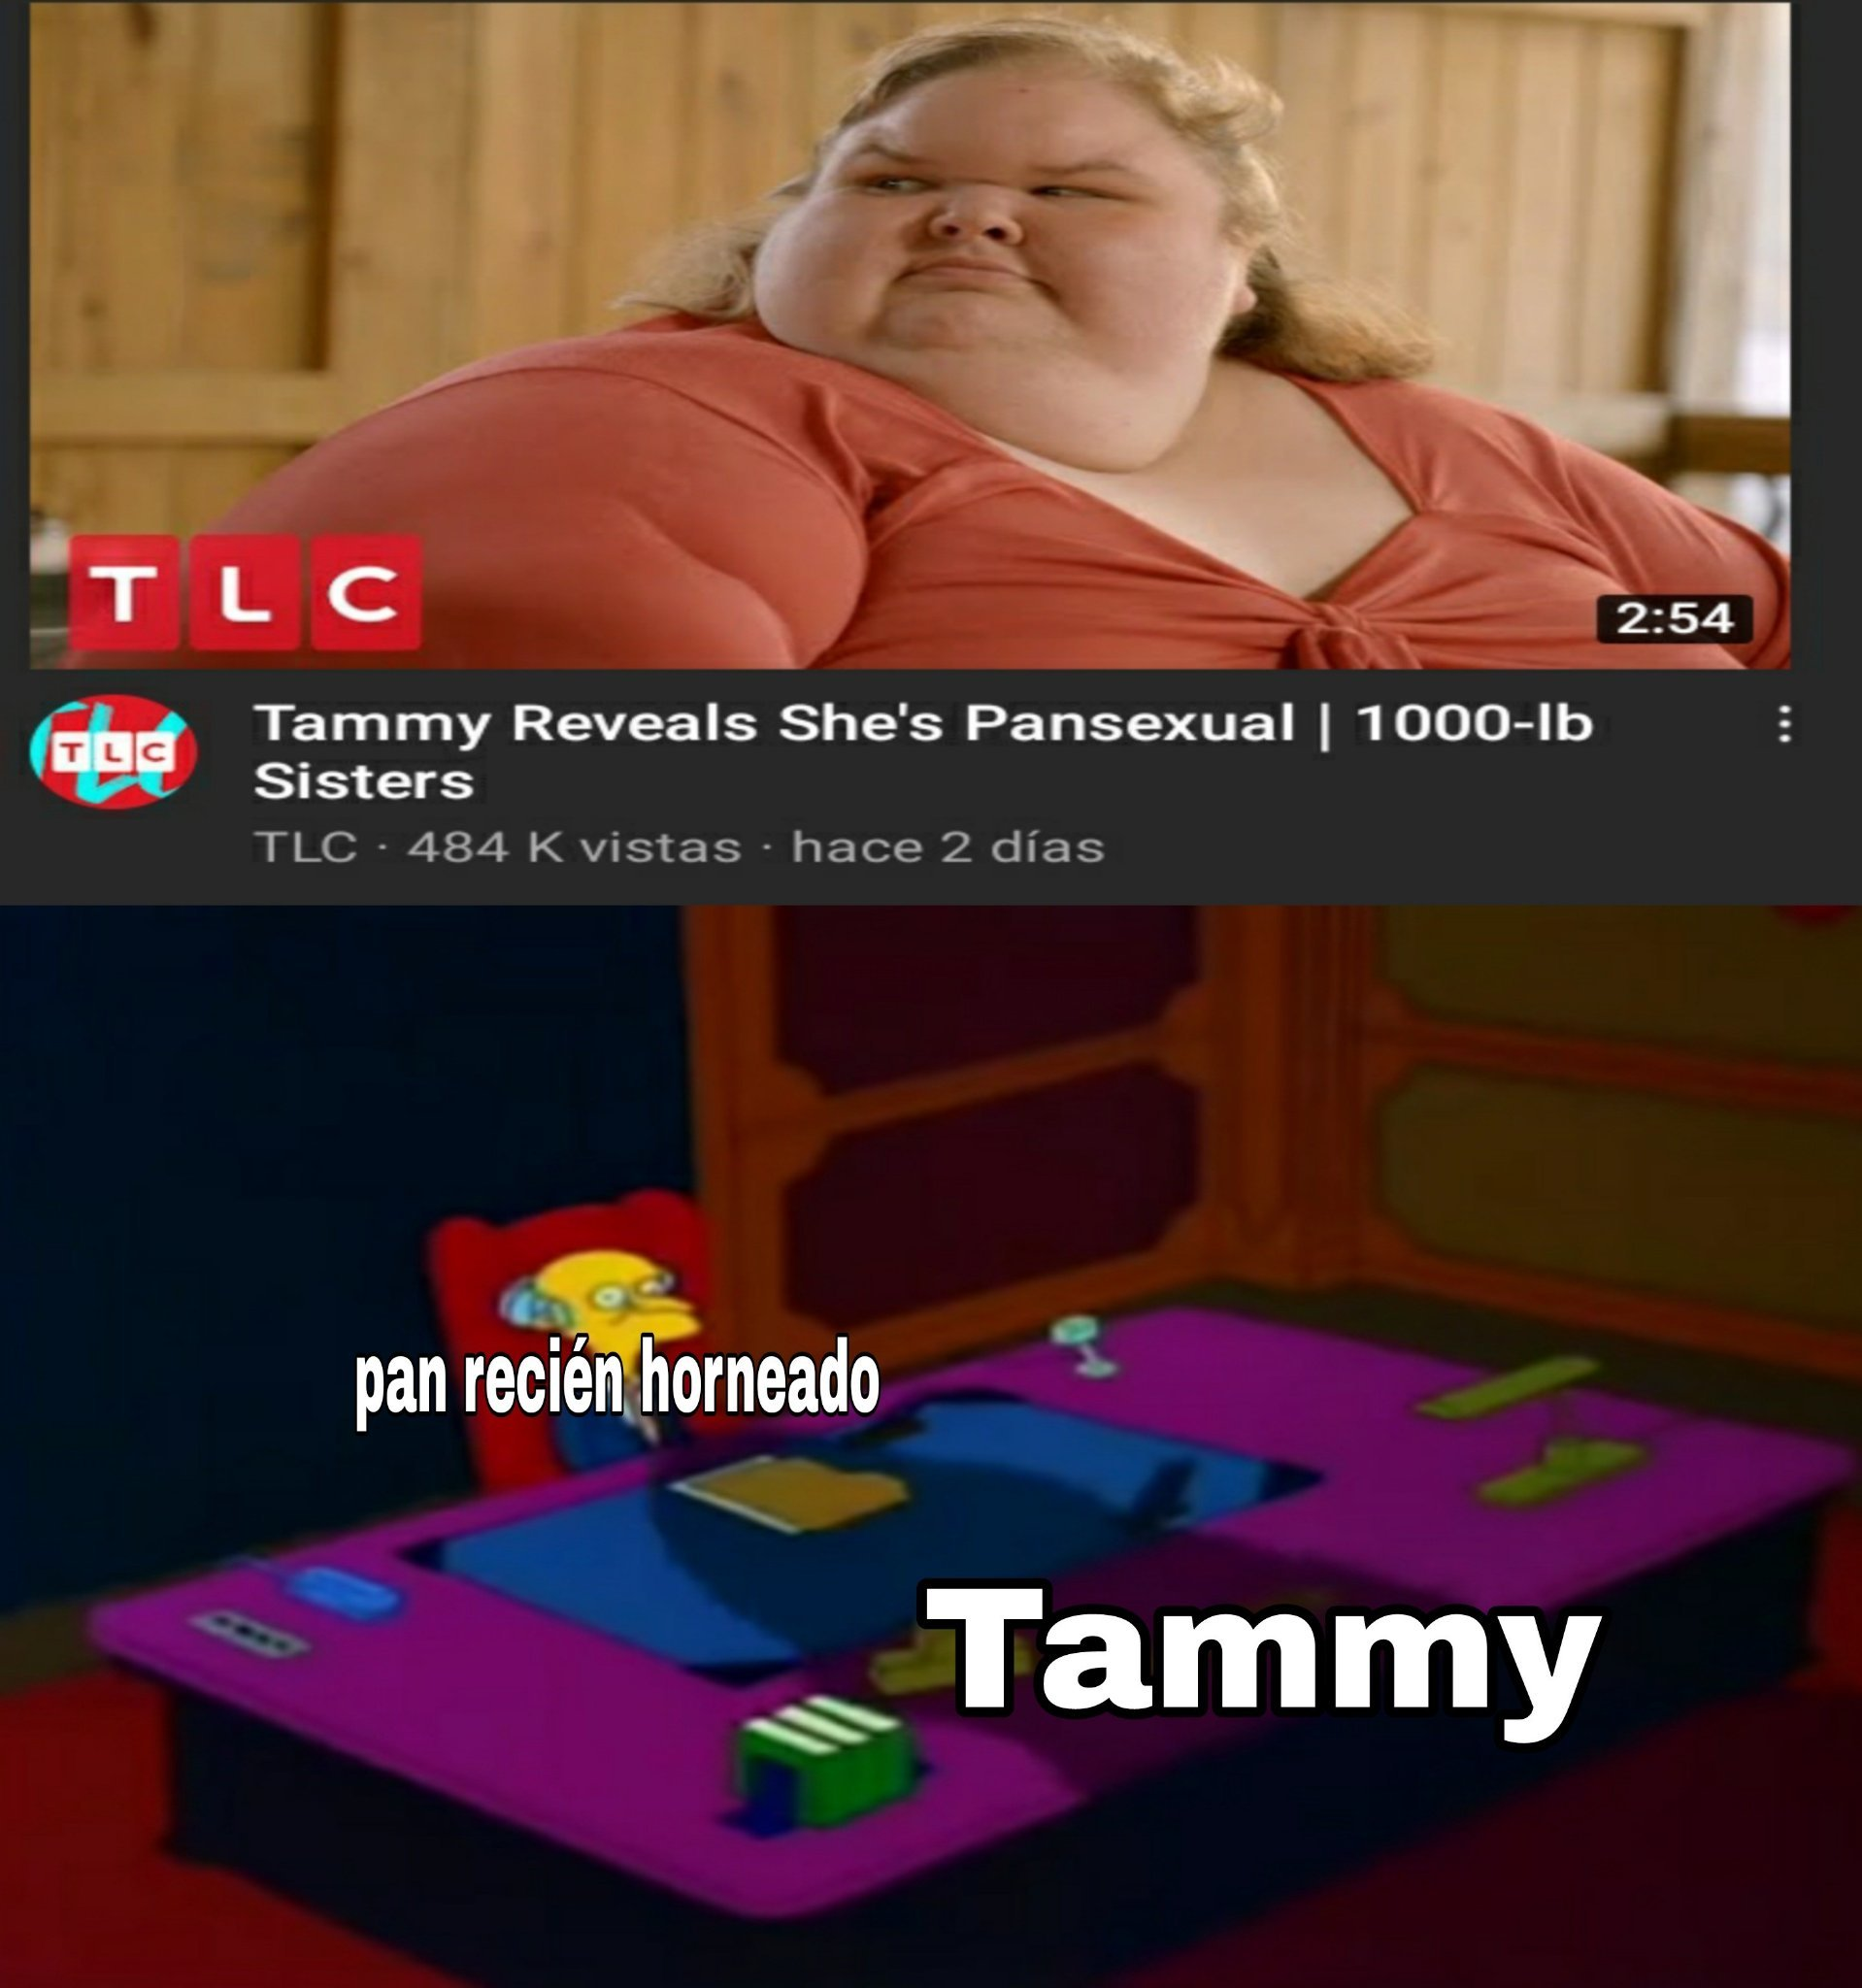 Tammy recién horny - meme